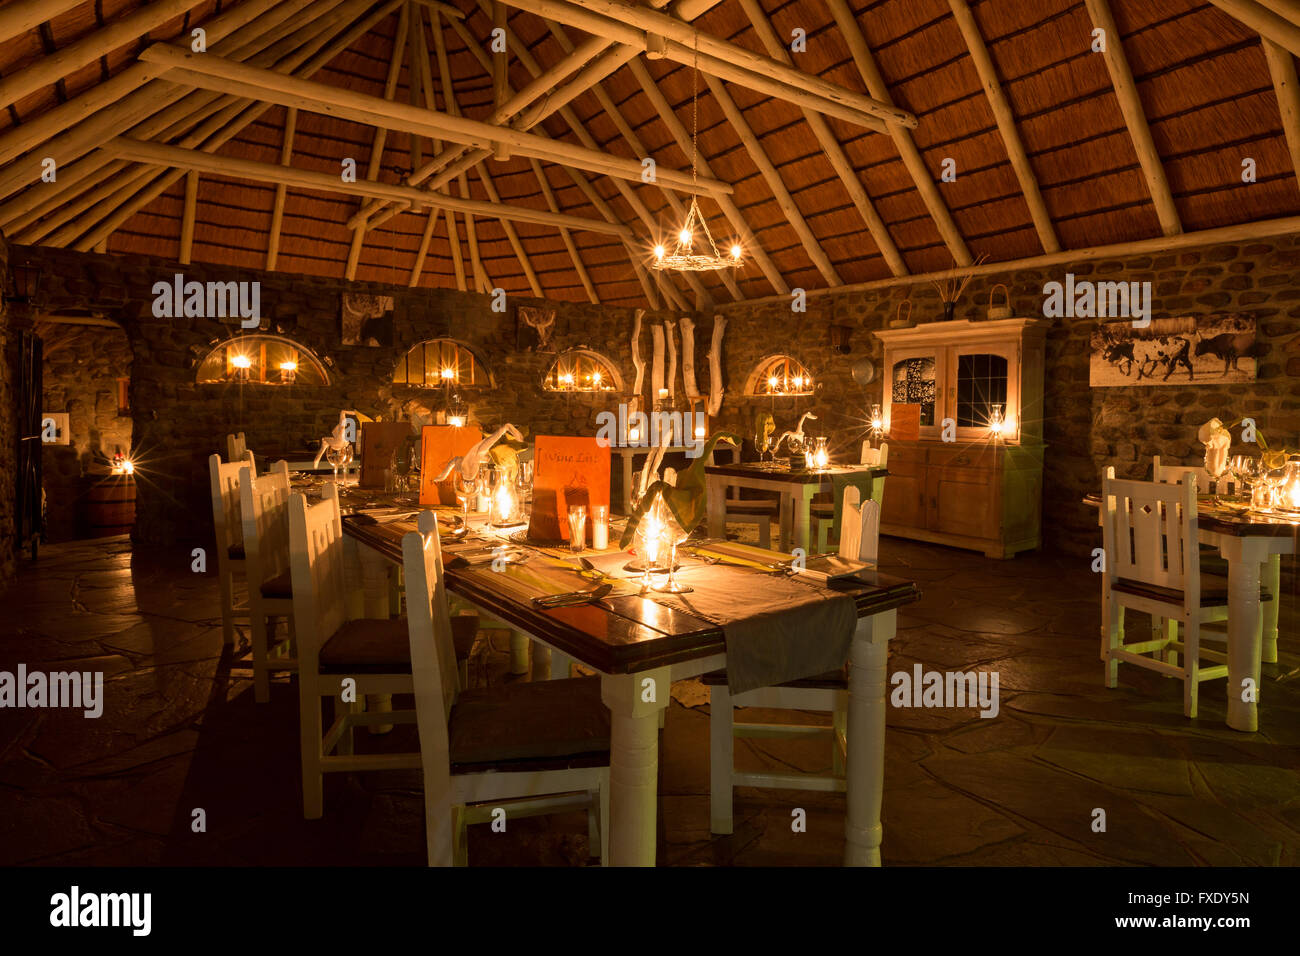 Laid tables in candlelight, Hotel The Elegant Farmstead, Okahandja, Namibia, Africa - Stock Image